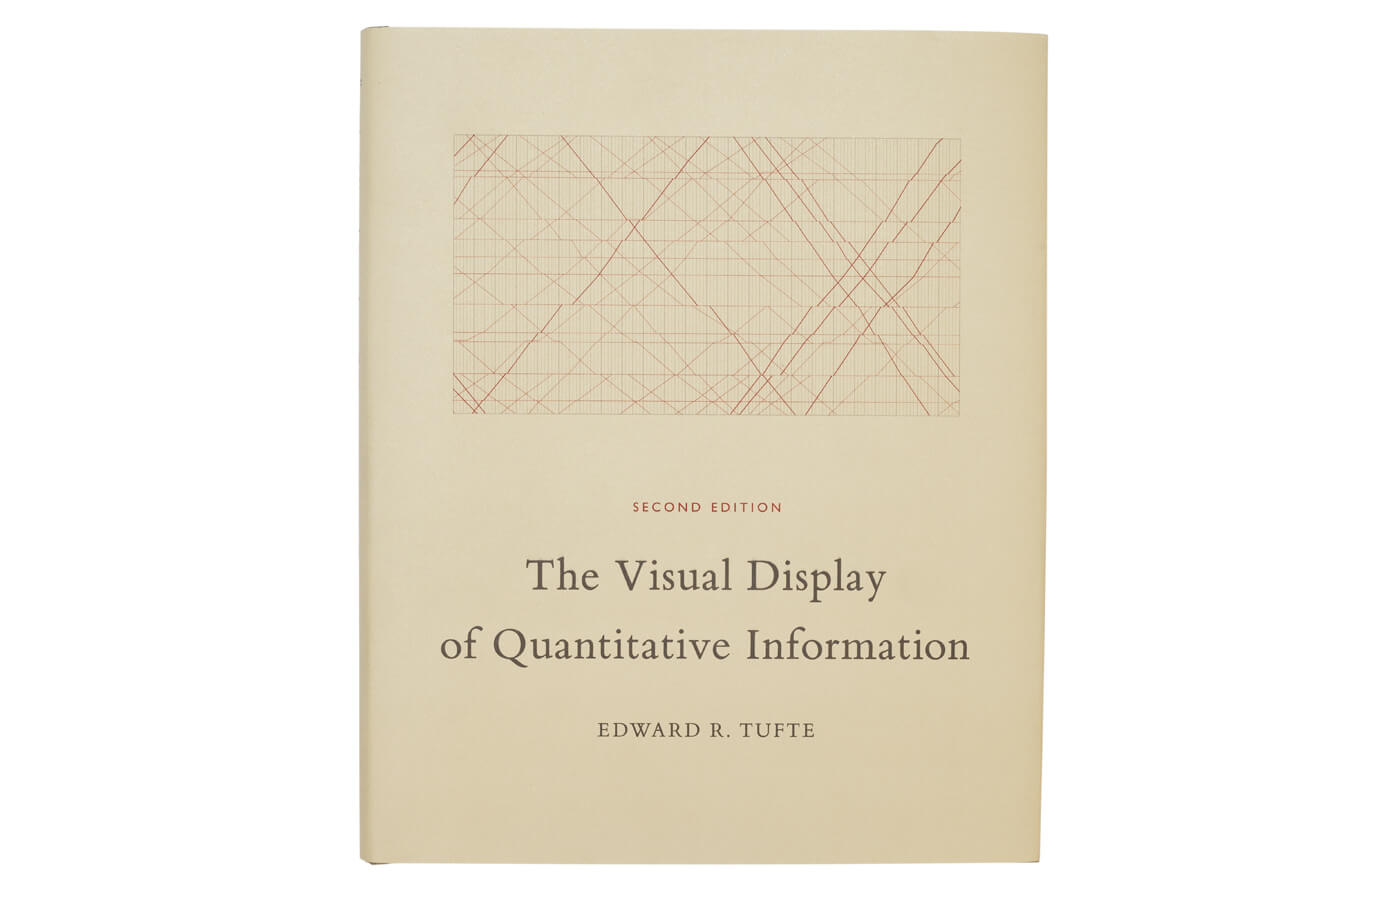 The Visual Display of Quantative Information